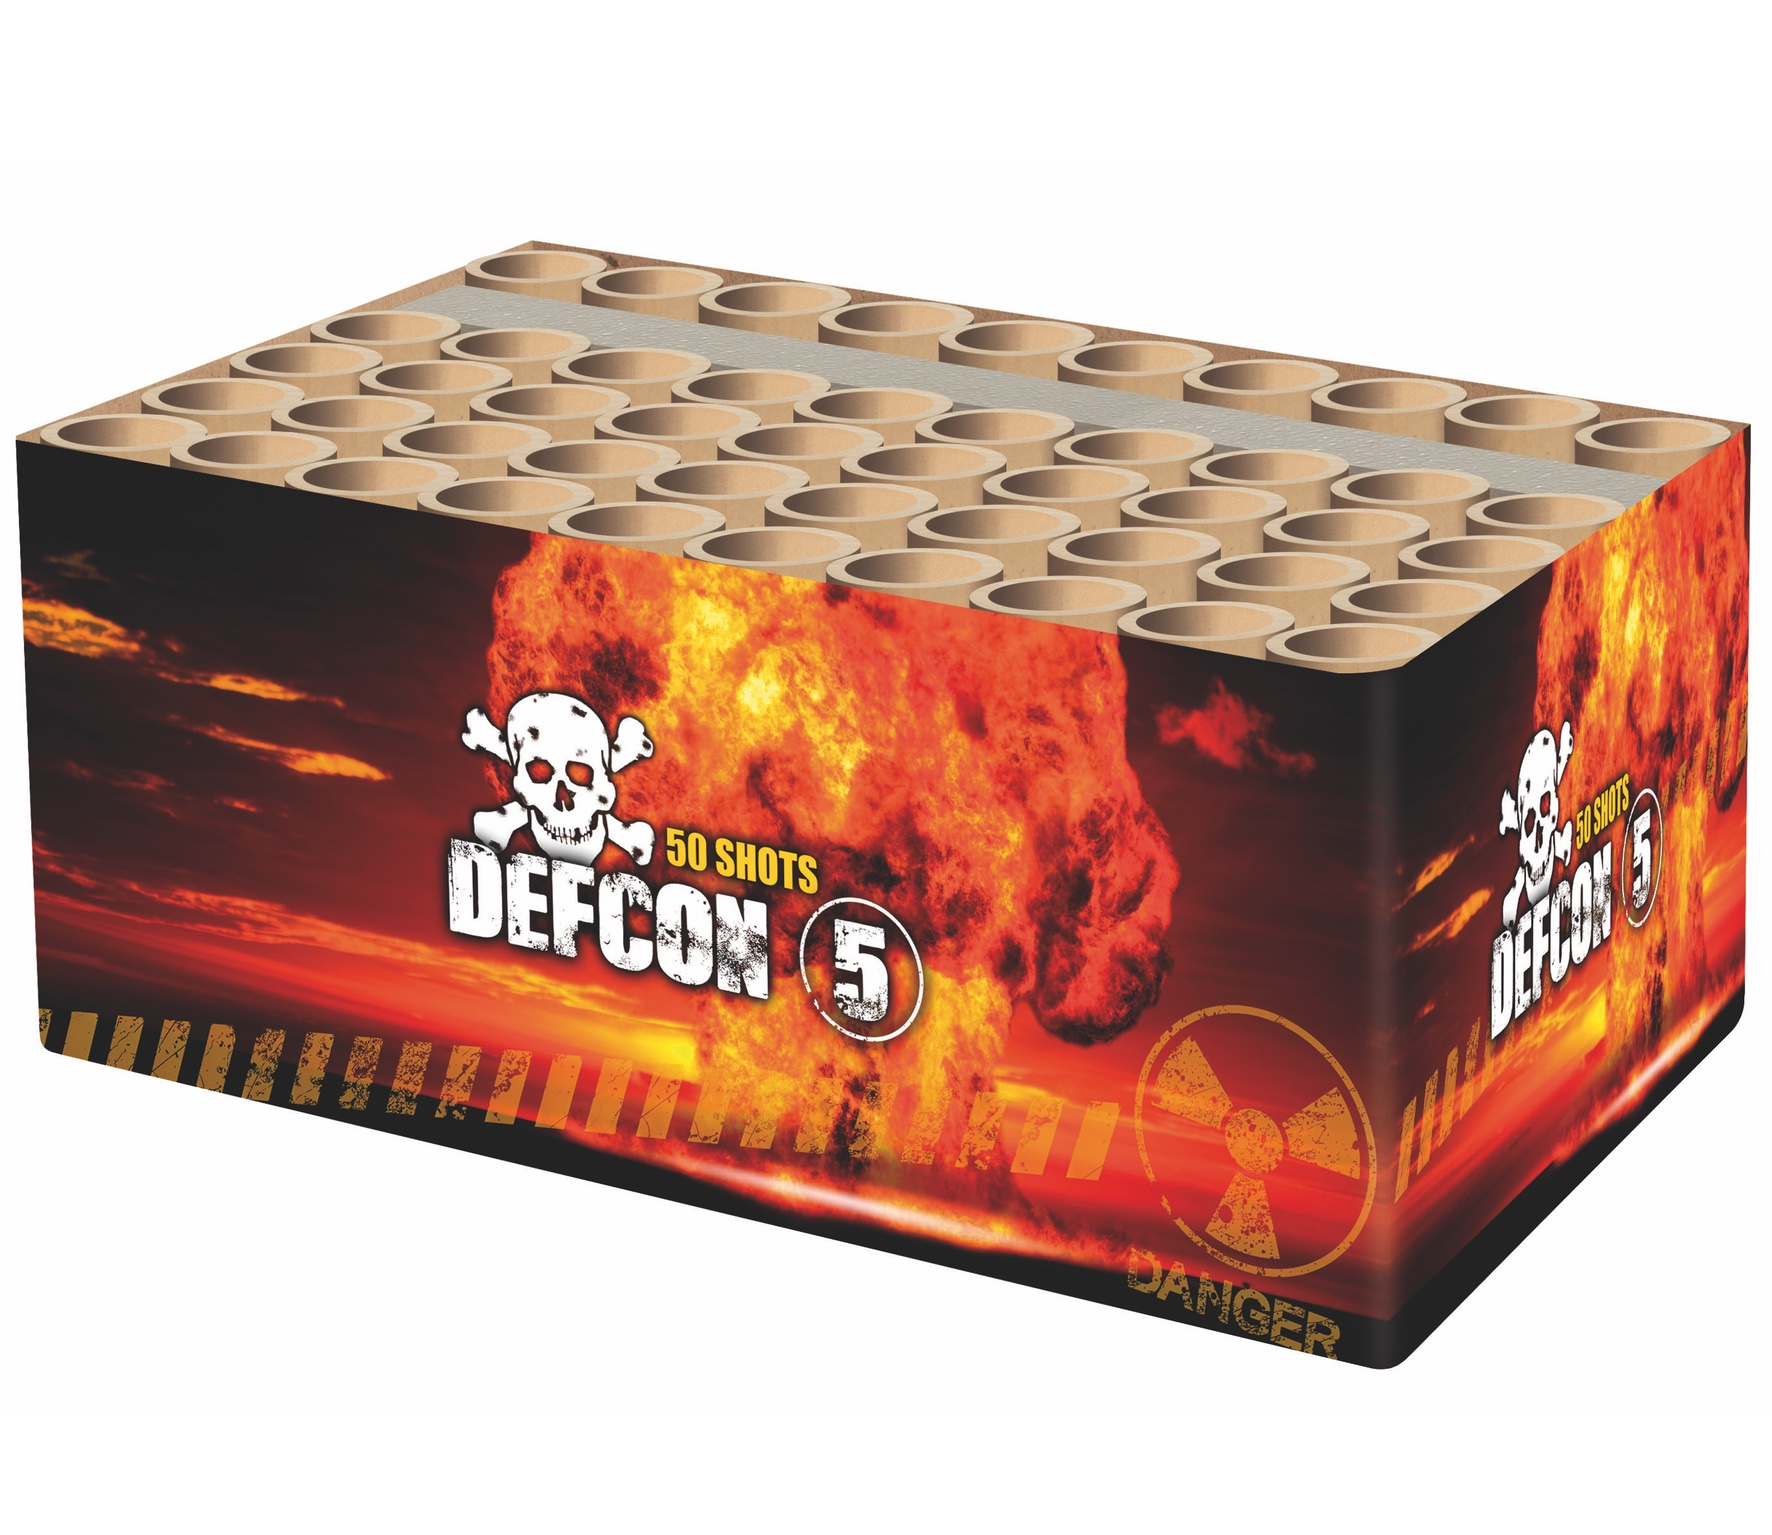 Defcon-5 Thundercake